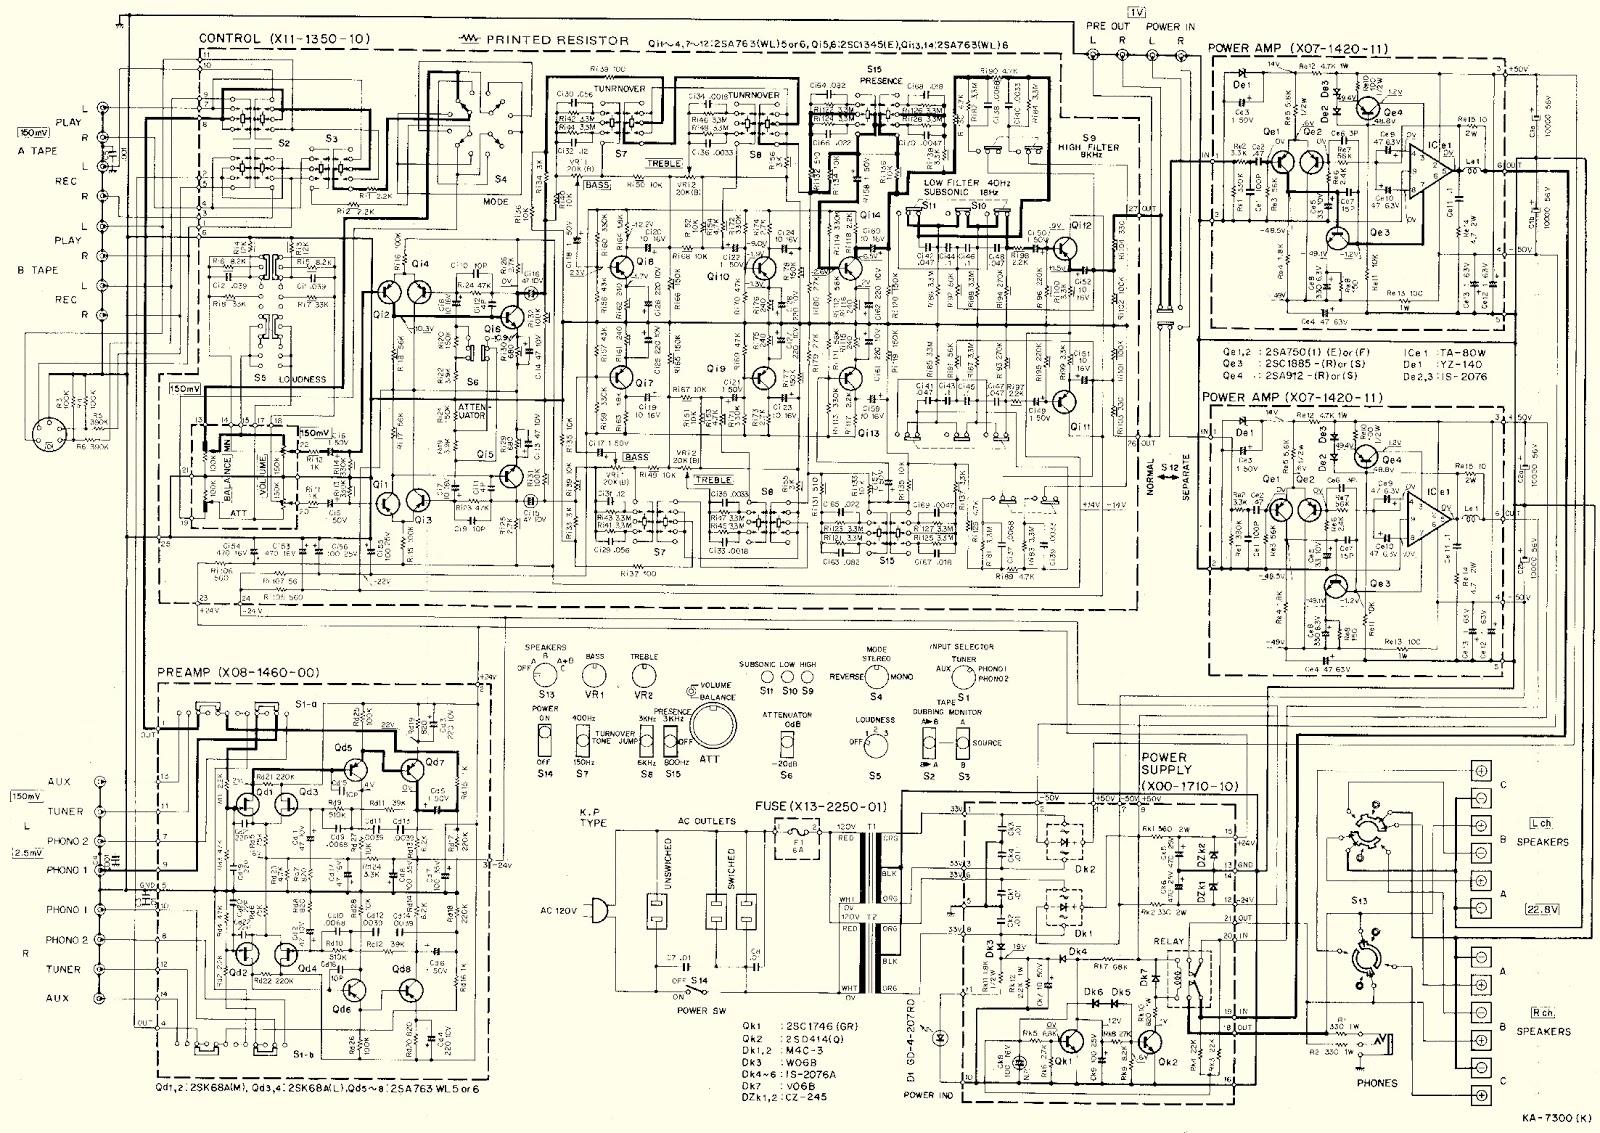 full schematic click on schematics to zoom in wiring diagram host click on schematic to zoom in wiring diagram for you full schematic click on schematics to zoom in